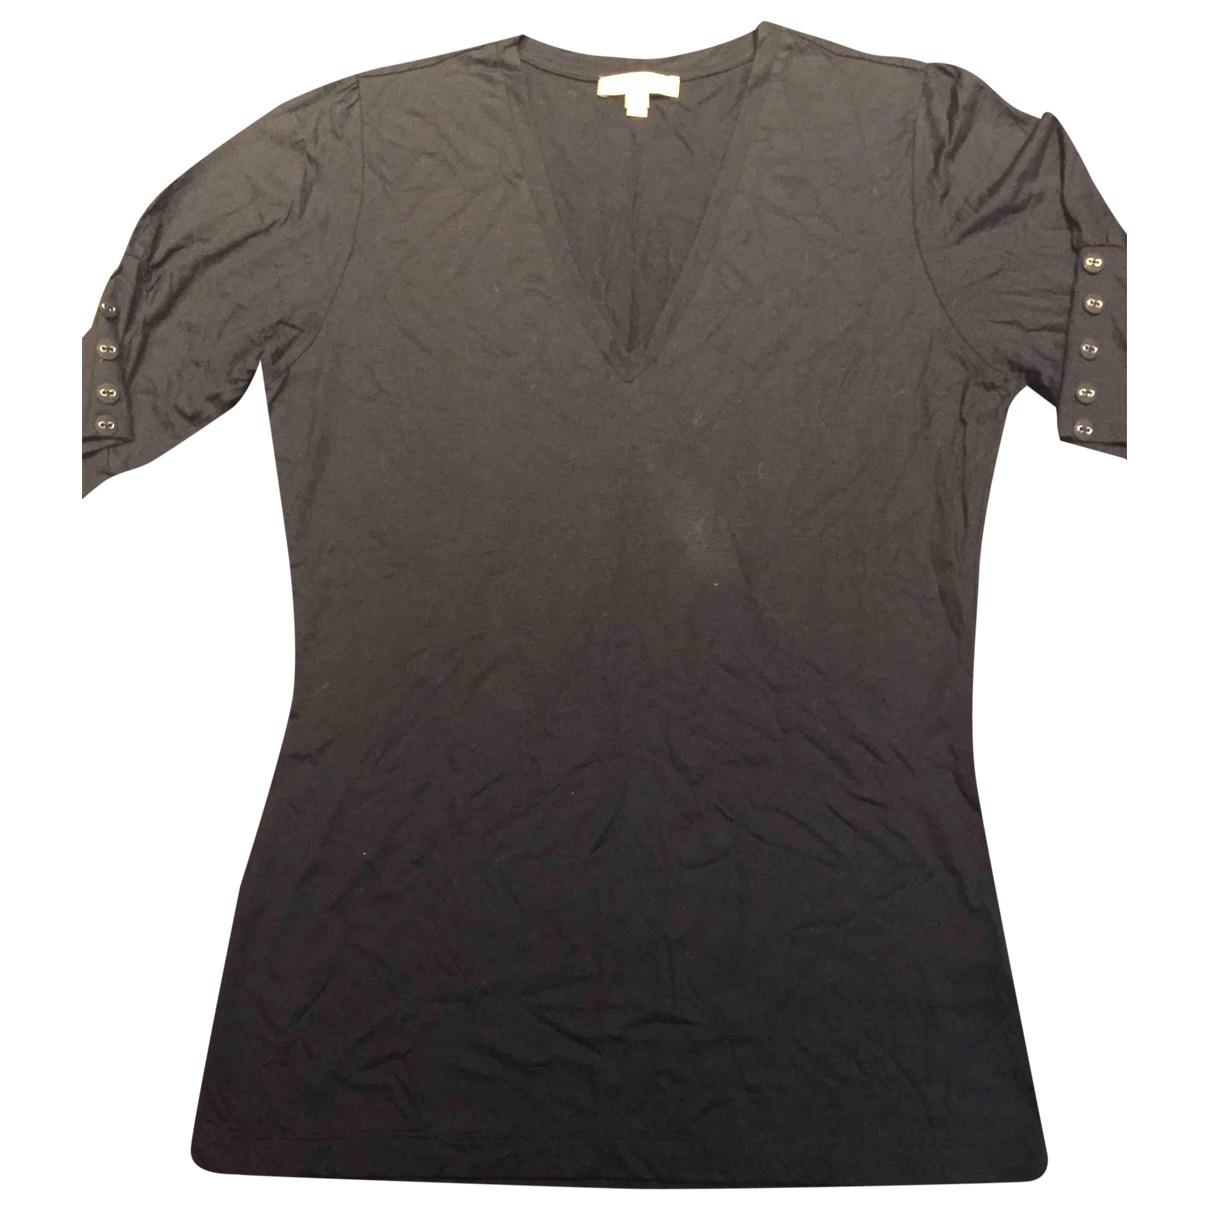 Burberry \N Black Cotton  top for Women L International